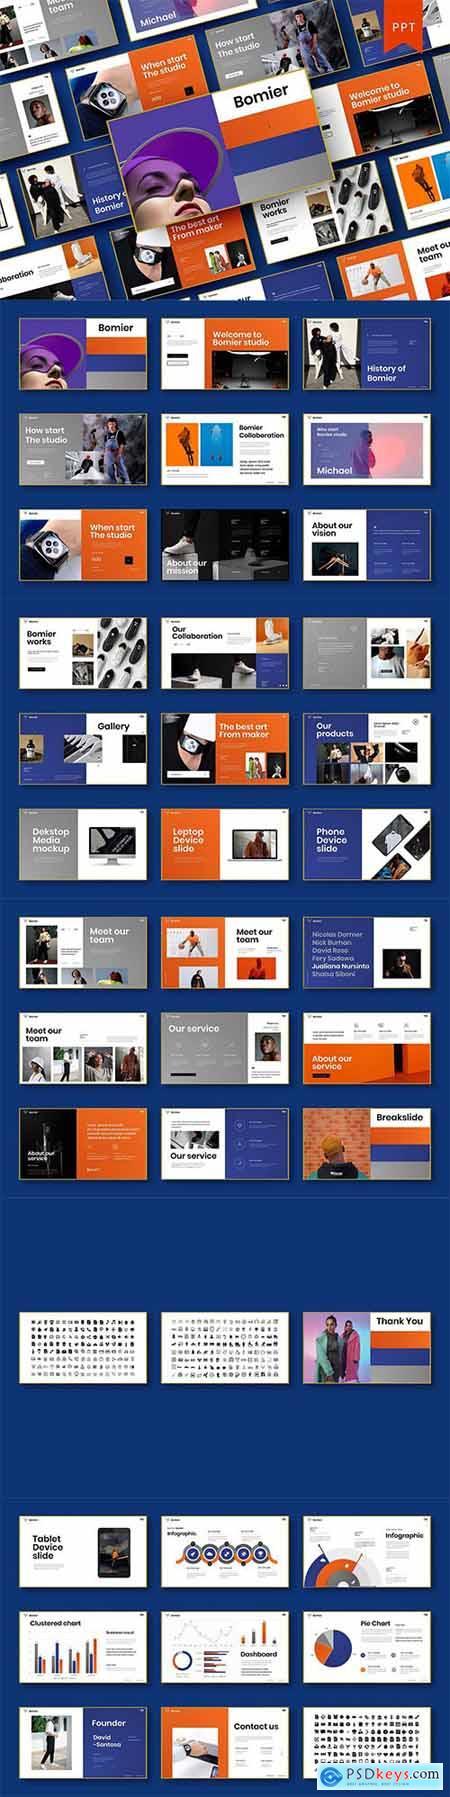 Bomier – Business PowerPoint Template